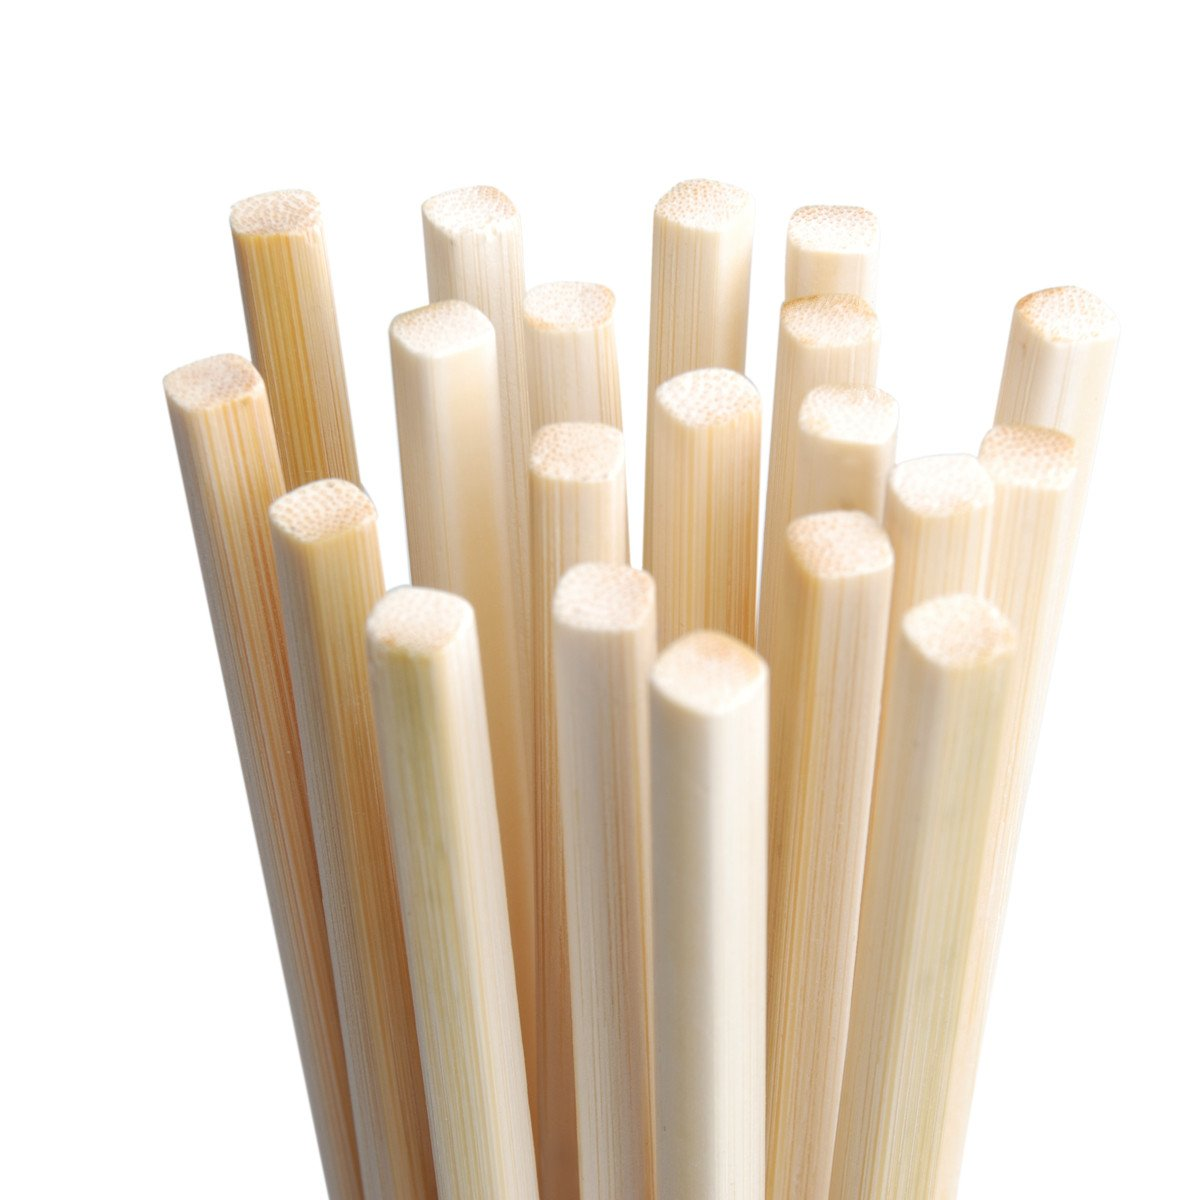 Natural Bamboo Chopsticks,Standard Pack of 10 Pairs - Mannice 24cm Long Mothproof Wooden Chopsticks, Color2